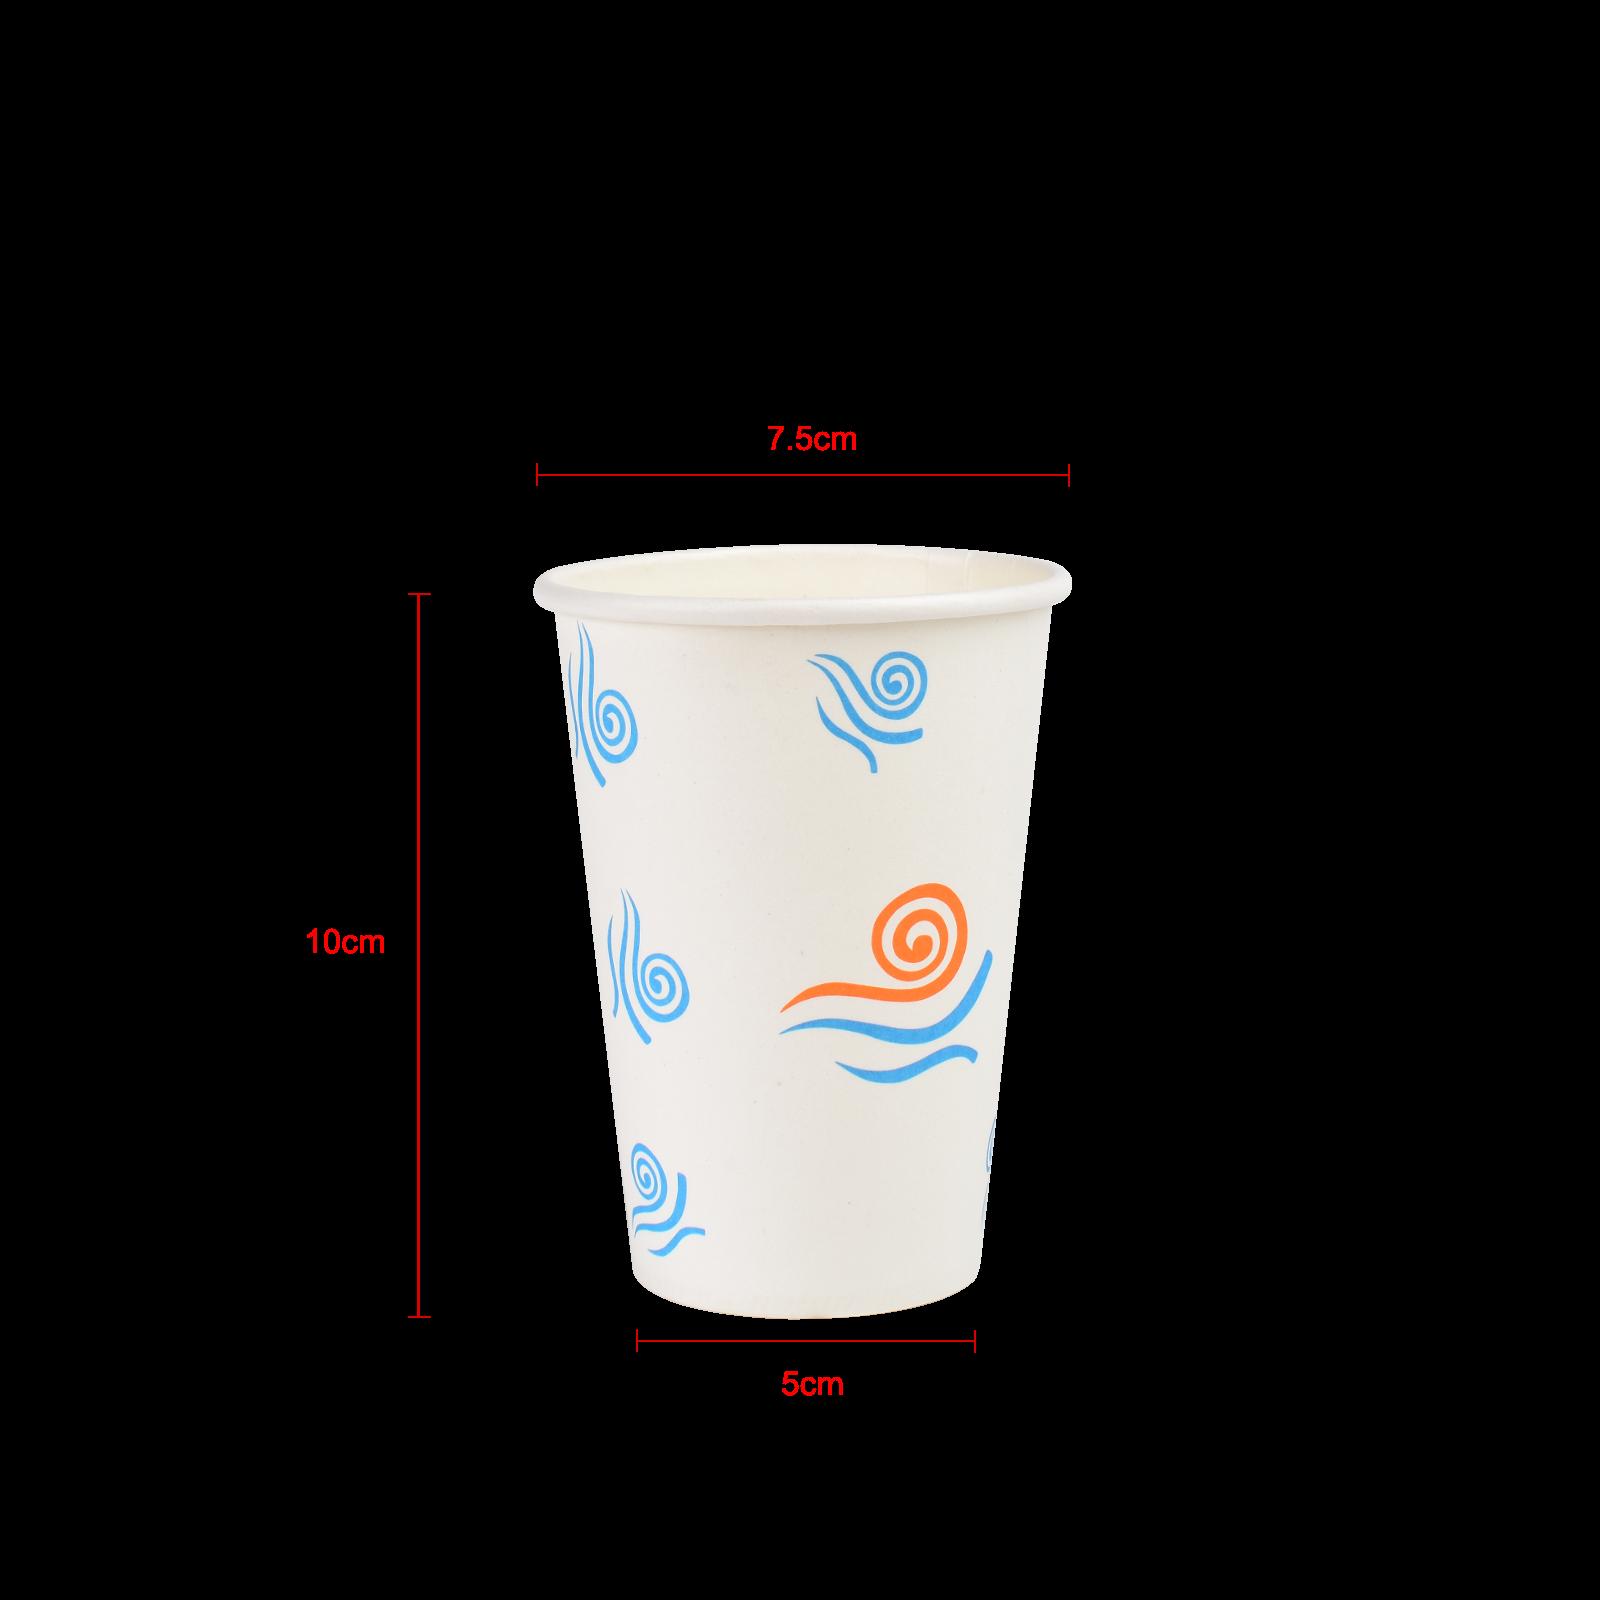 12OZ Paper Cup with design 100pcs RM9.10.png